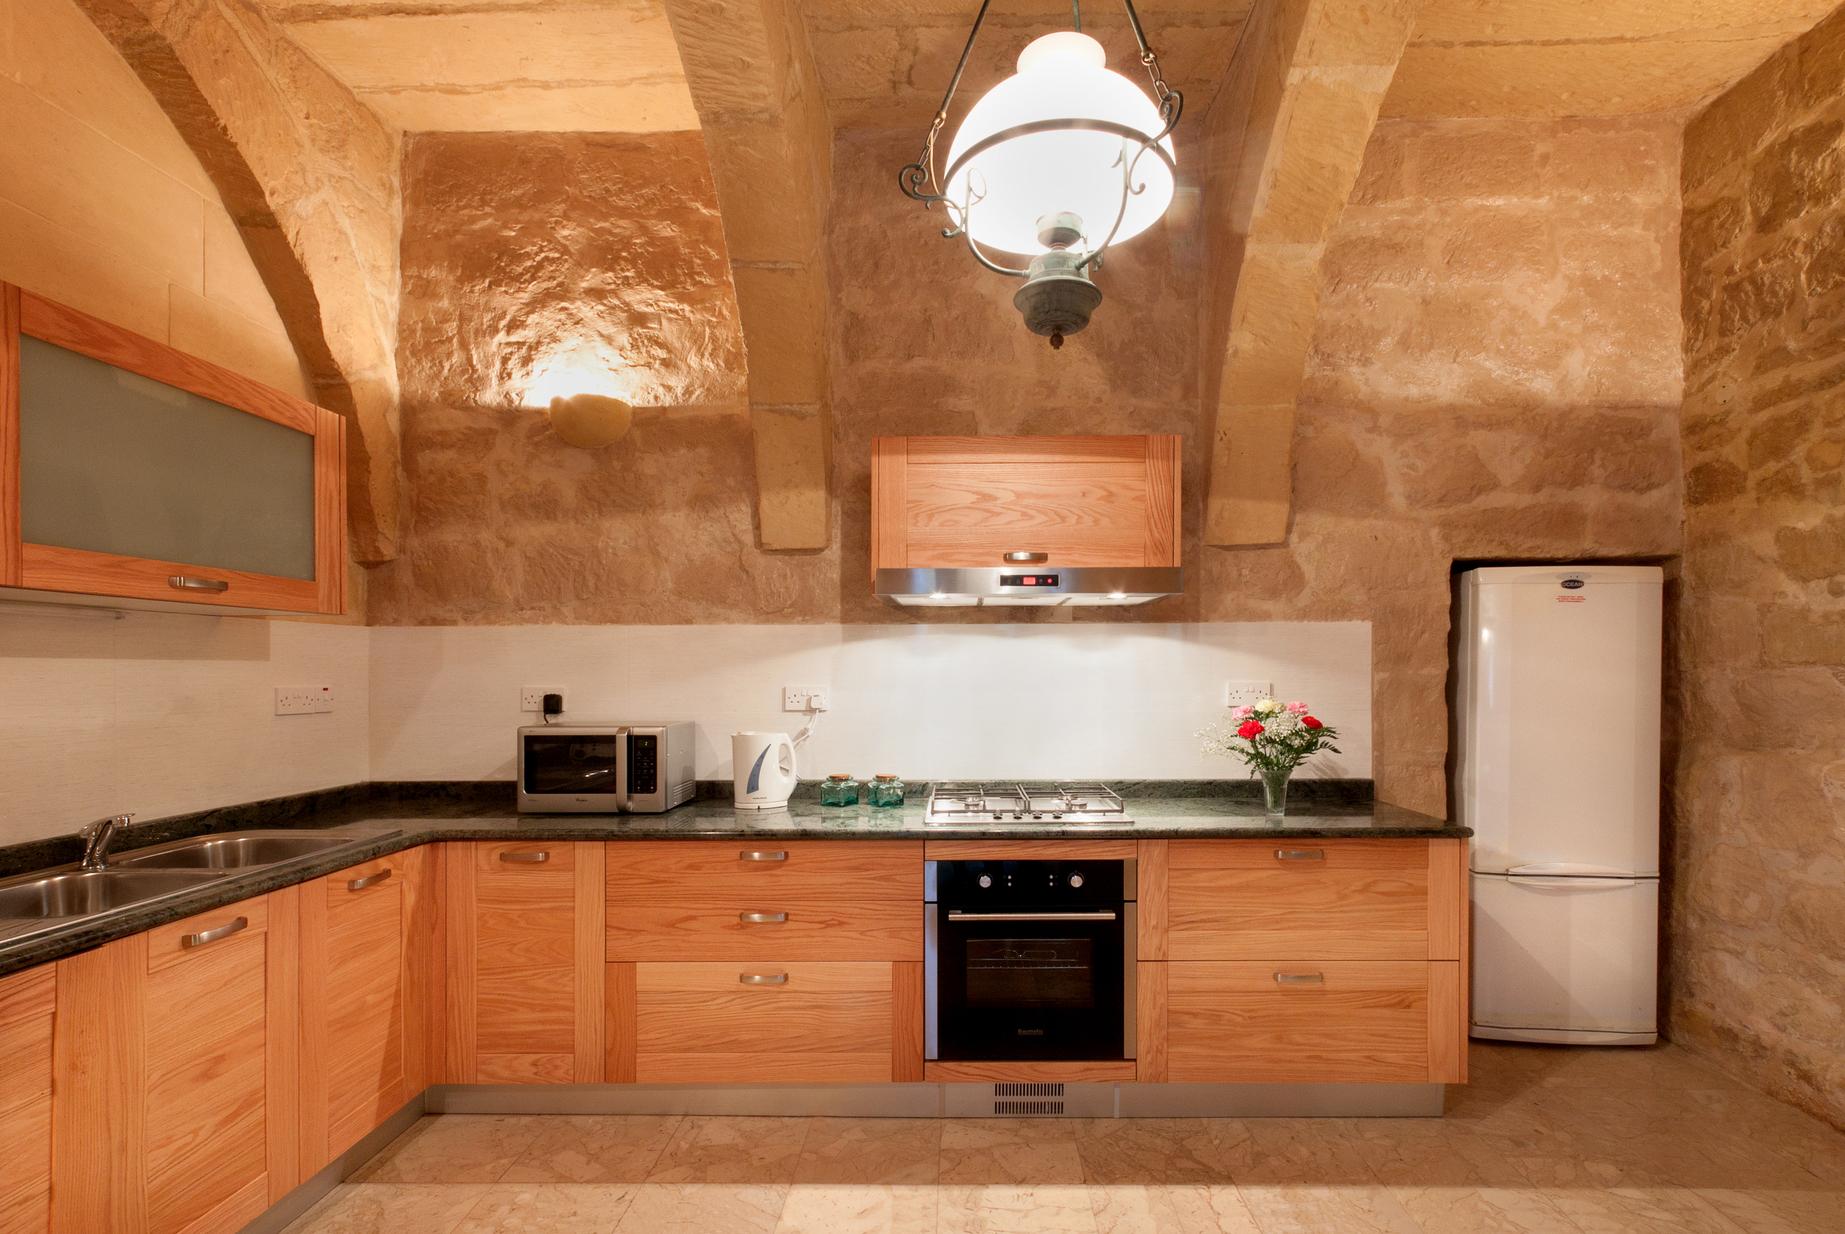 2 bed Villa For Sale in San Lawrenz, San Lawrenz - thumb 6